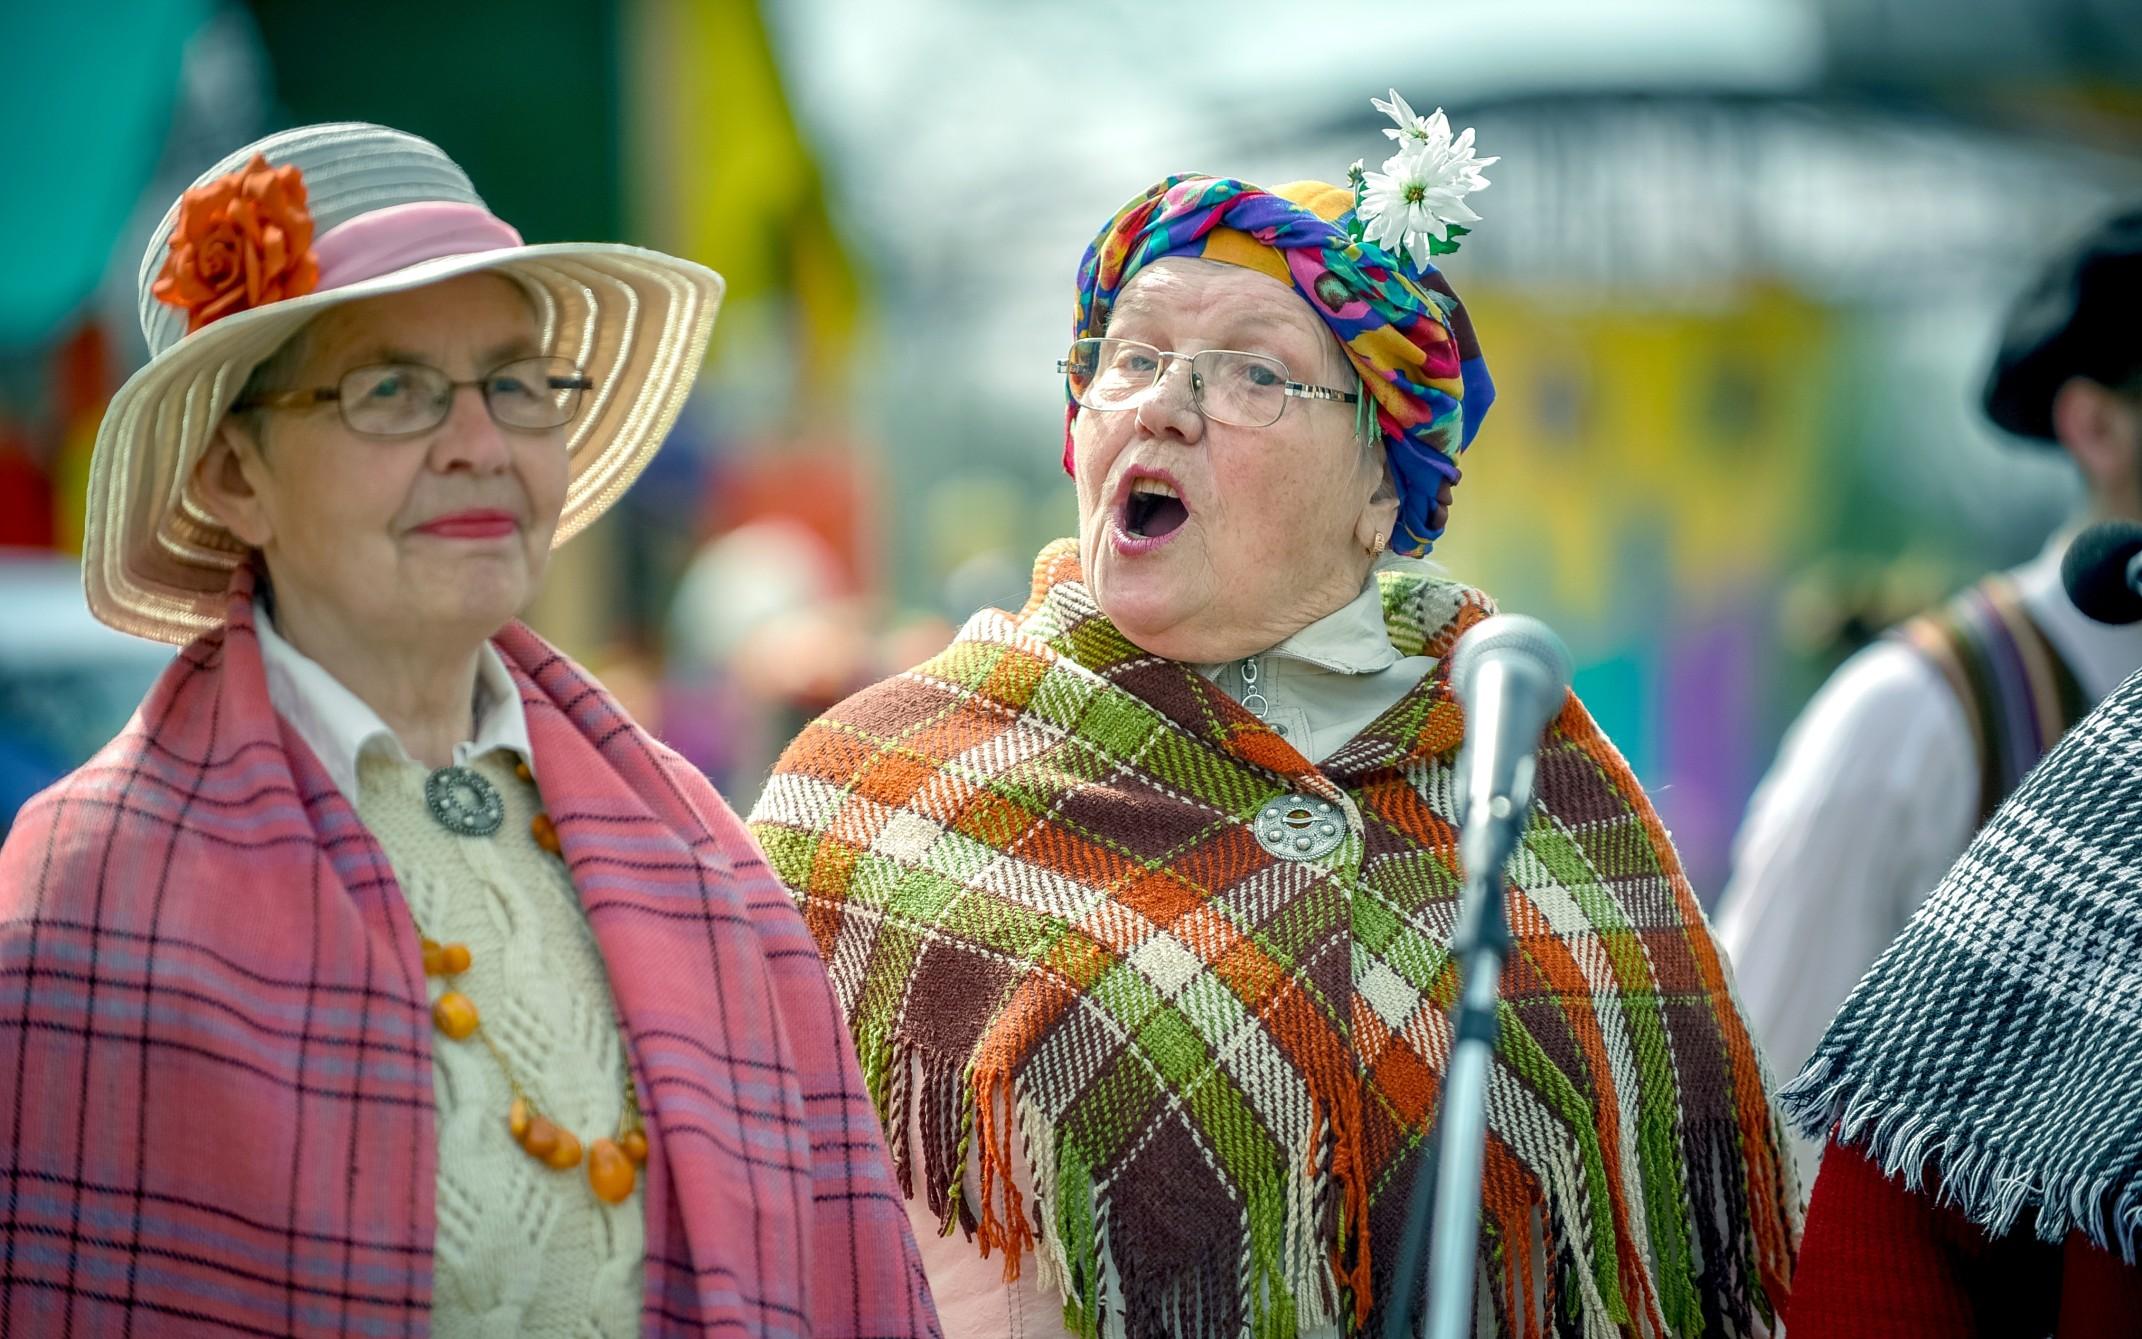 seniors-singing-in-costume-at-latvian-festival